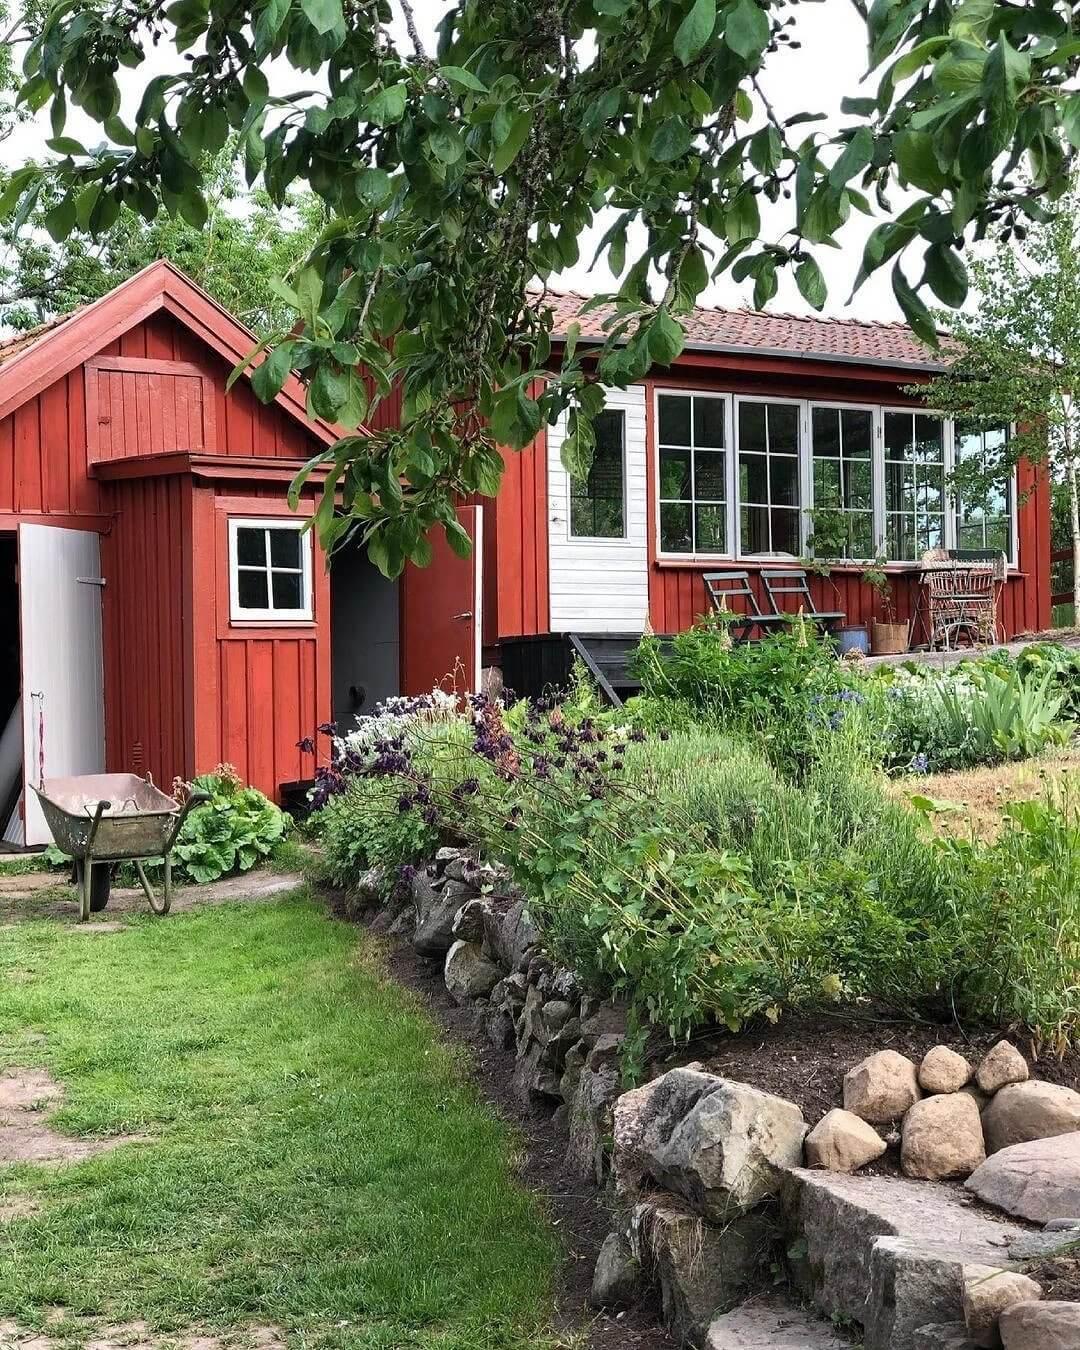 2. Scandinavian